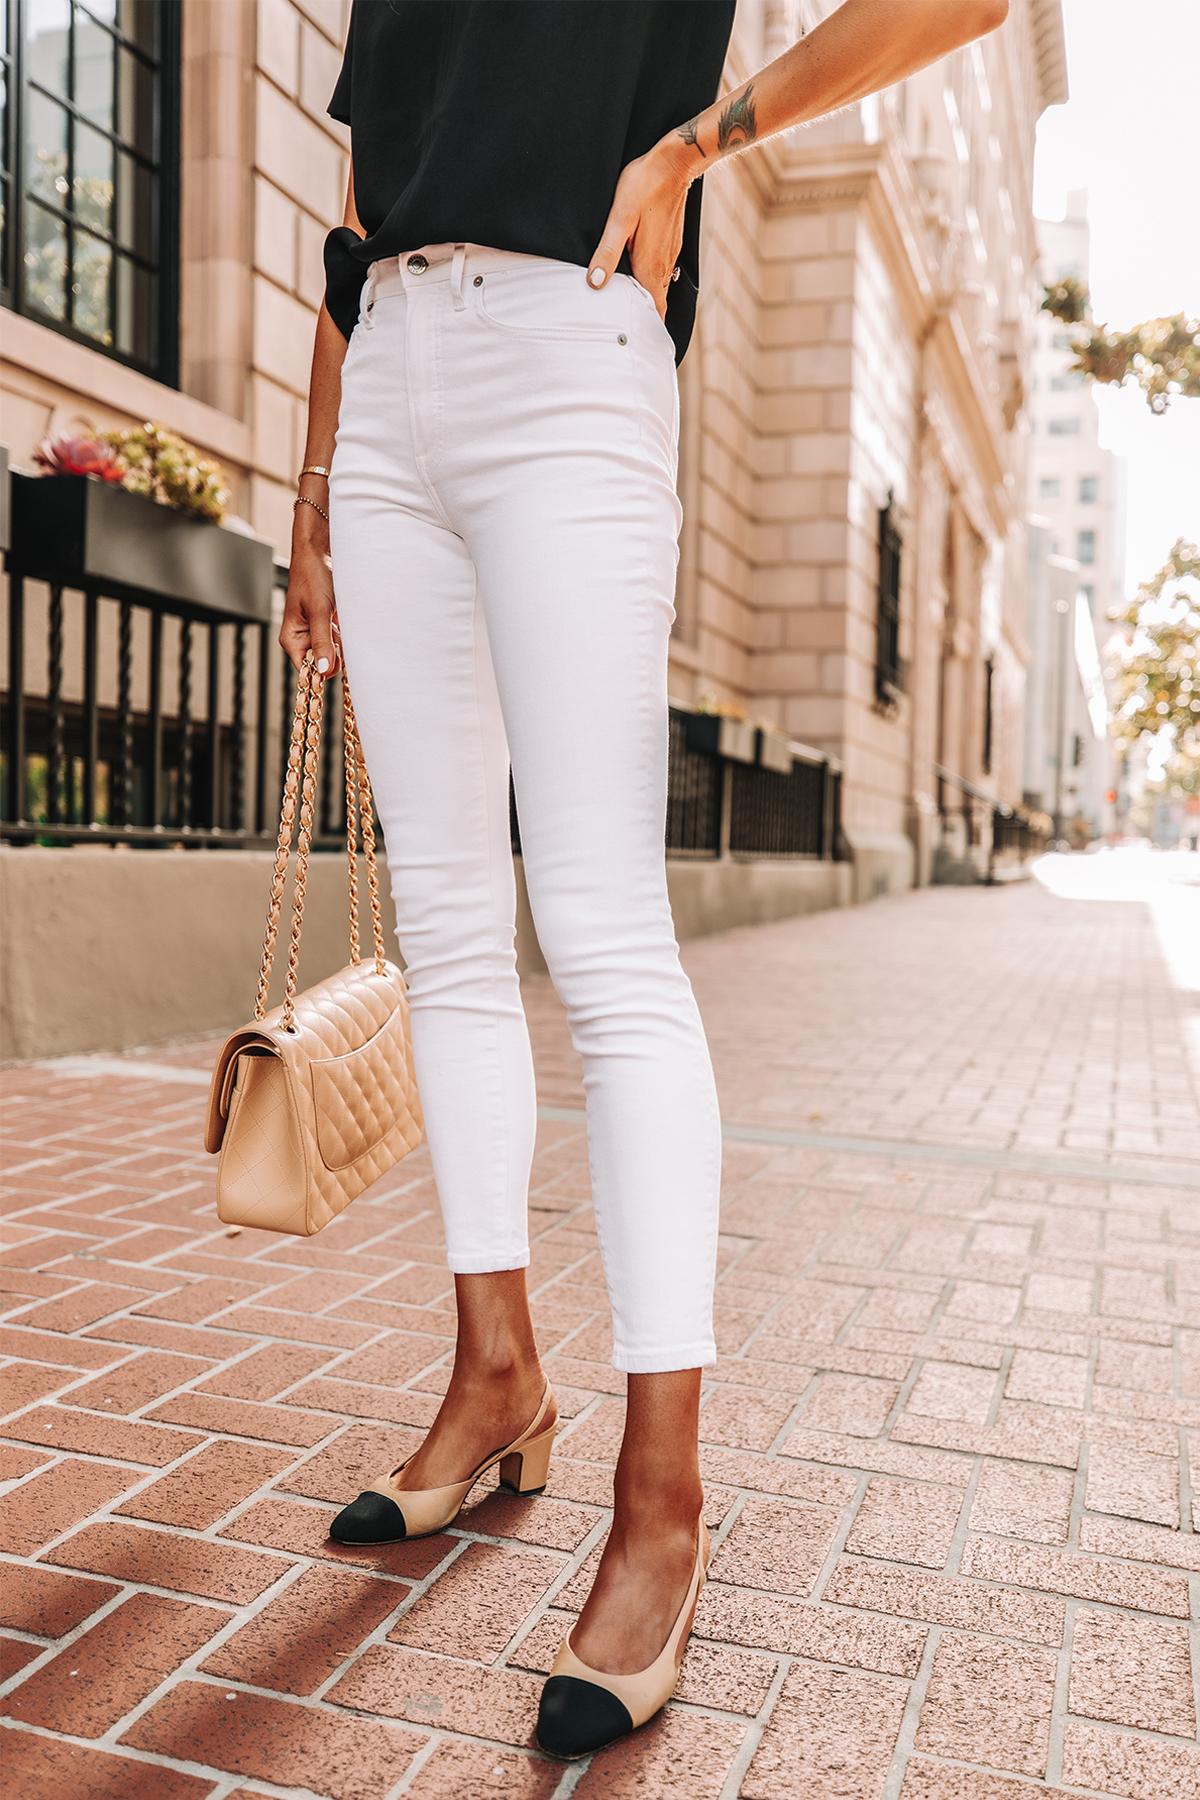 Fashion Jackson Wearing Everlane Black Top Everlane High Rise White Skinny Jeans Chanel Slingbacks Chanel Beige Handbag 1